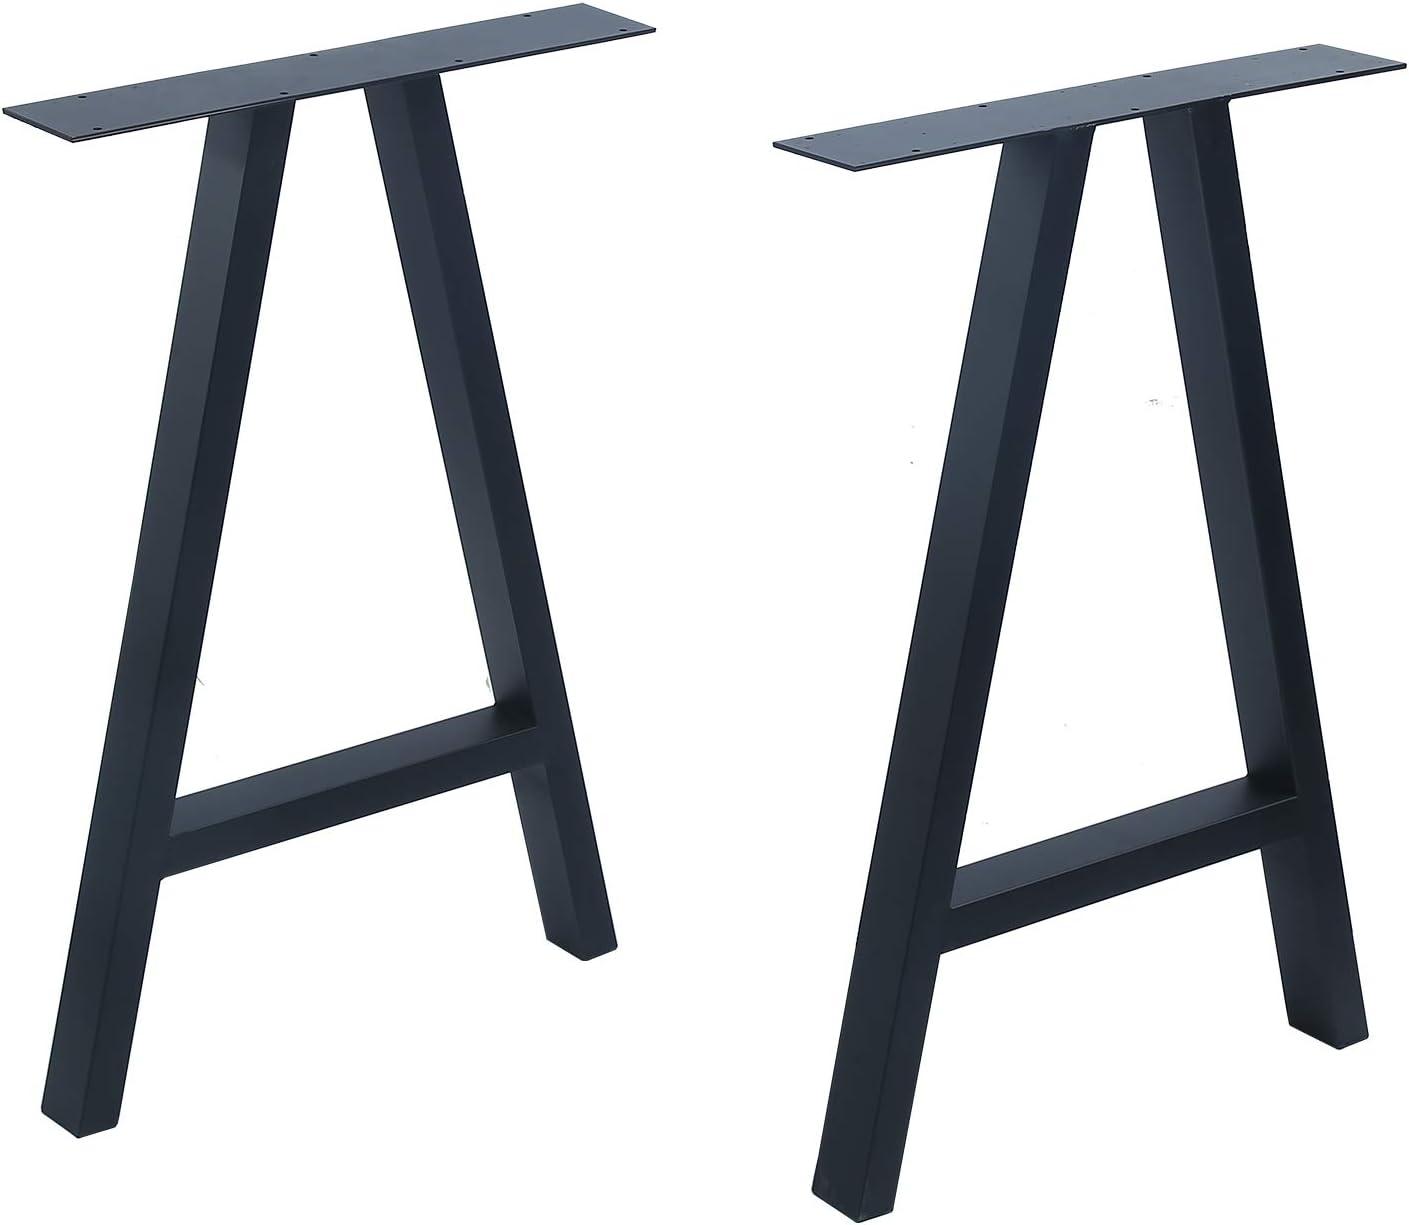 MBQQ 2 Pcs Furniture Legs Rustic Decory A Shape Table Legs,Heavy